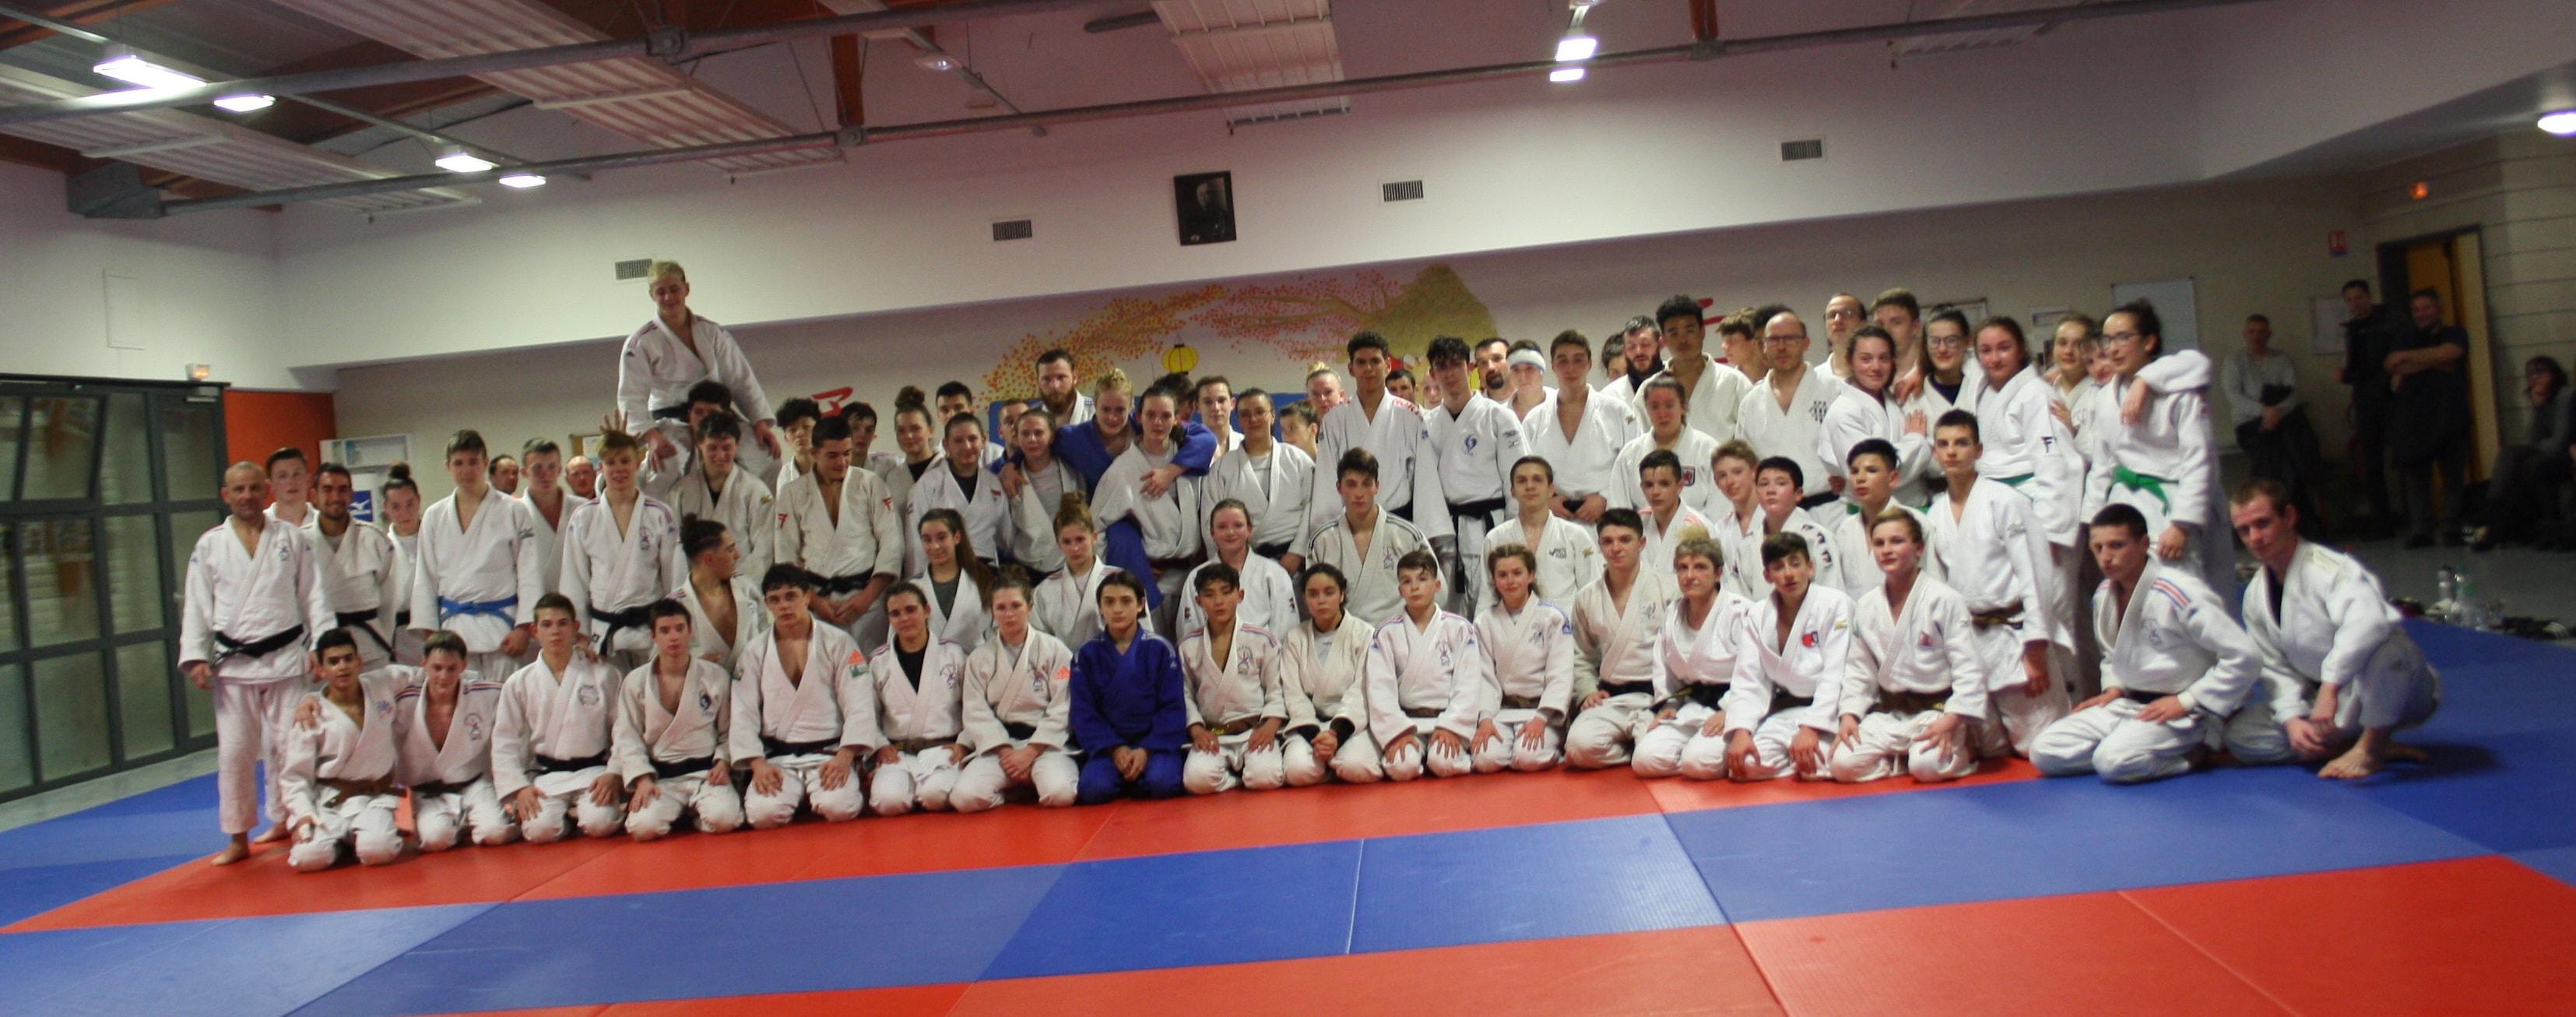 Interreg Judo Training - Saint Julien-lès-Metz 14.03.2019